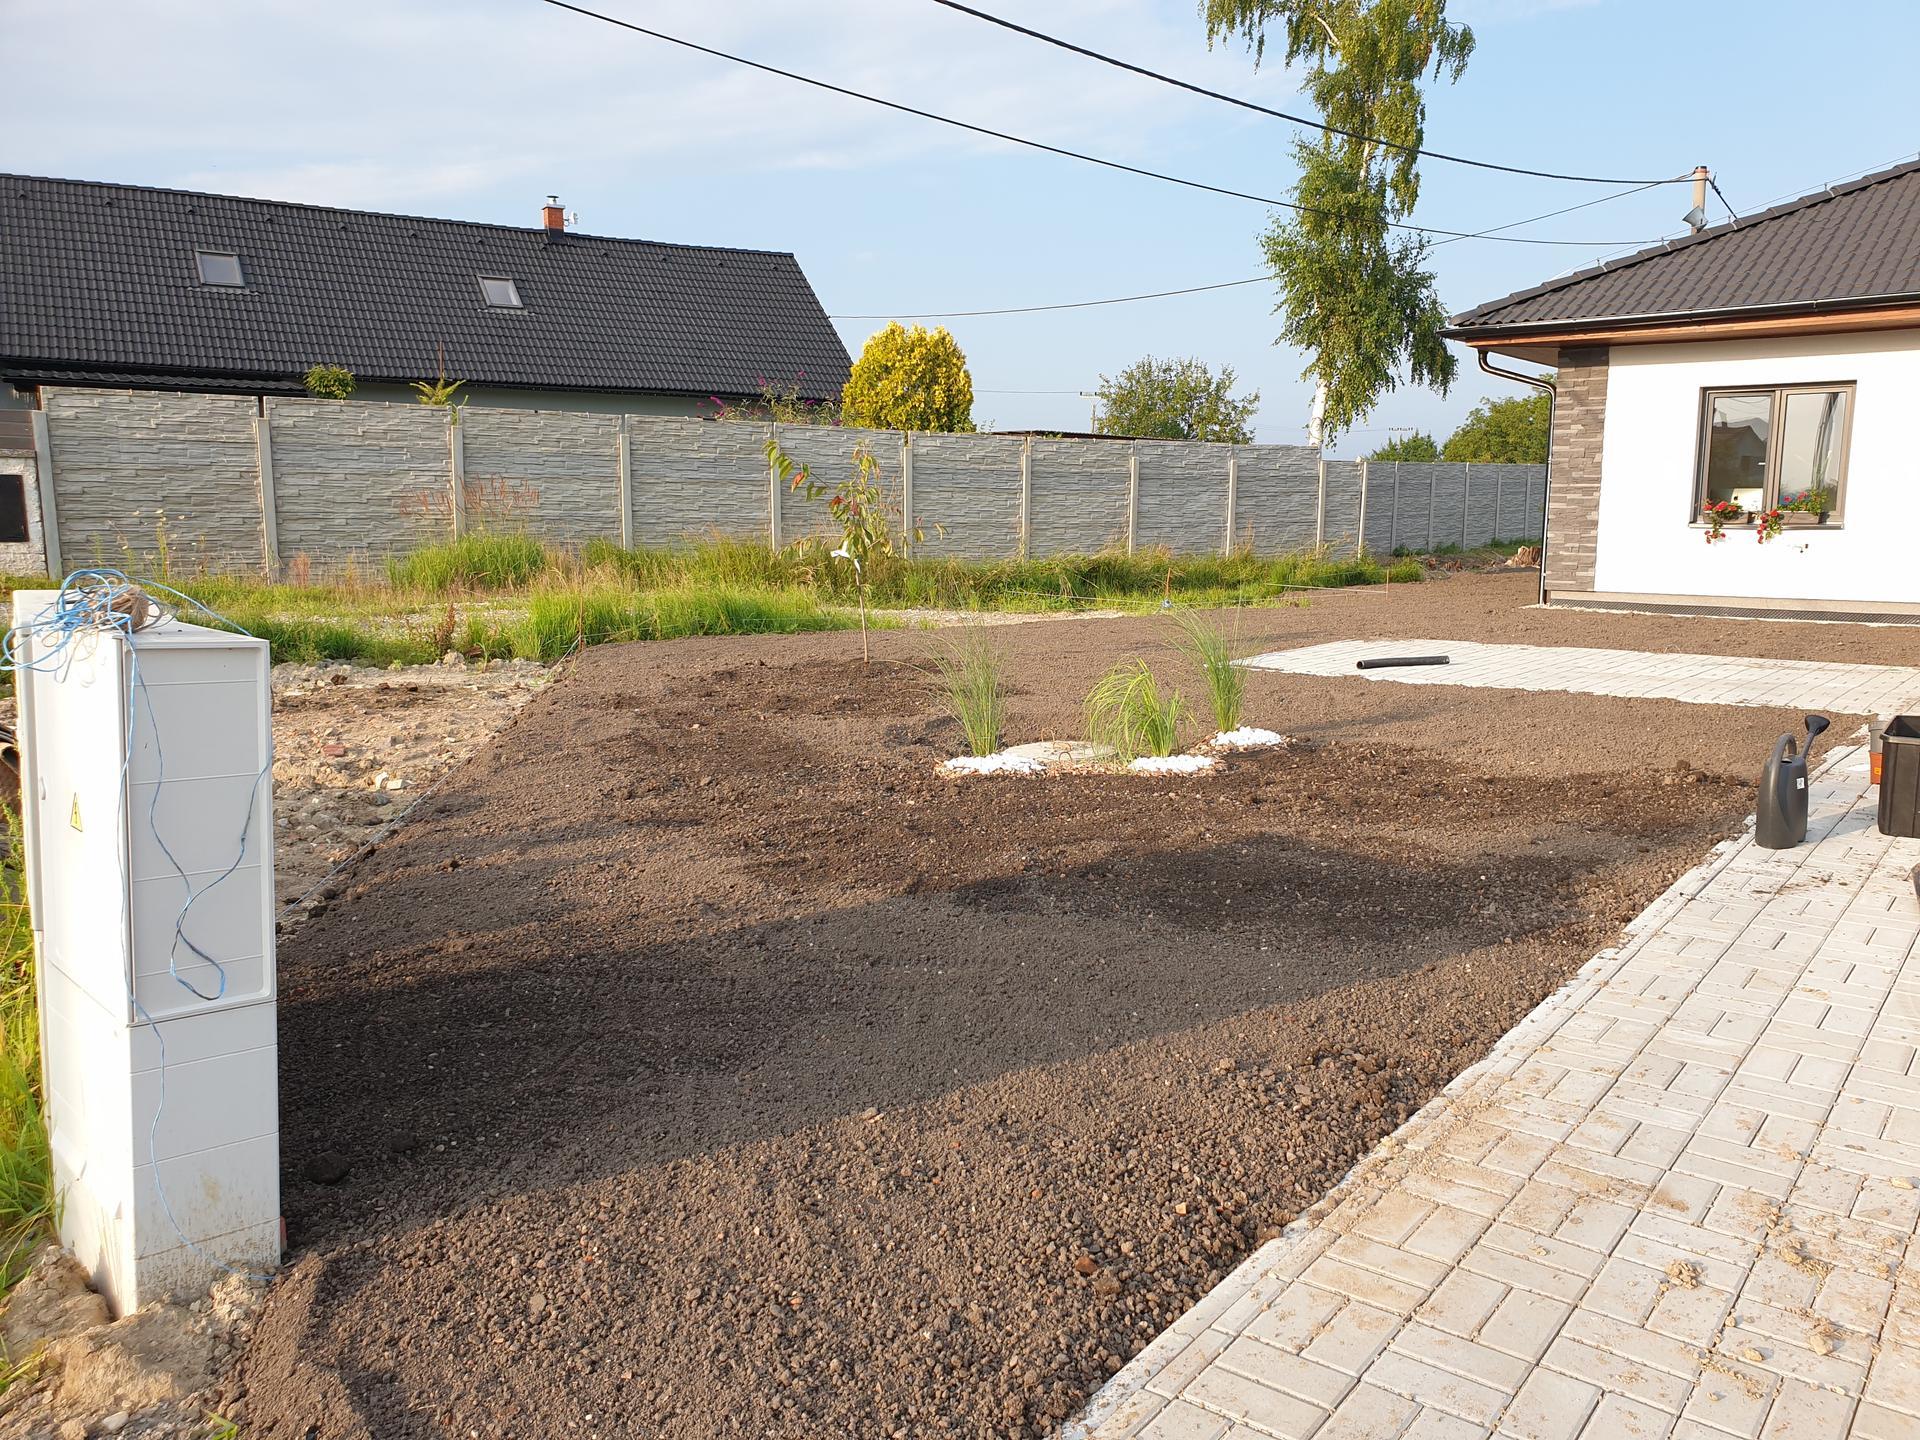 Zahrada a terasa - Obrázek č. 52